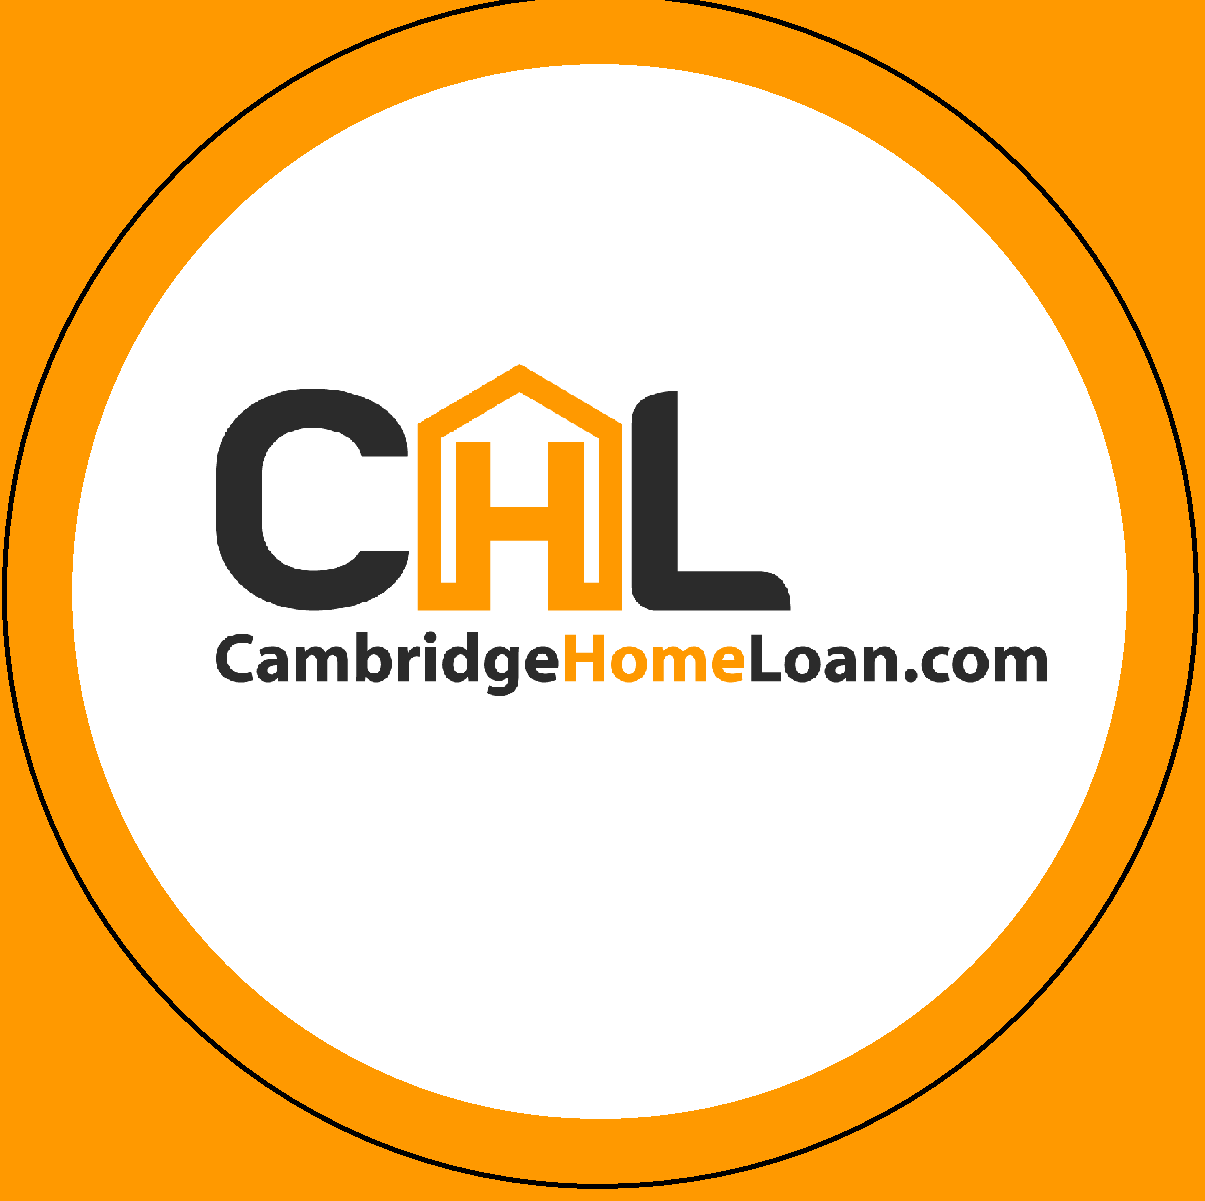 Cambridge Home Loan